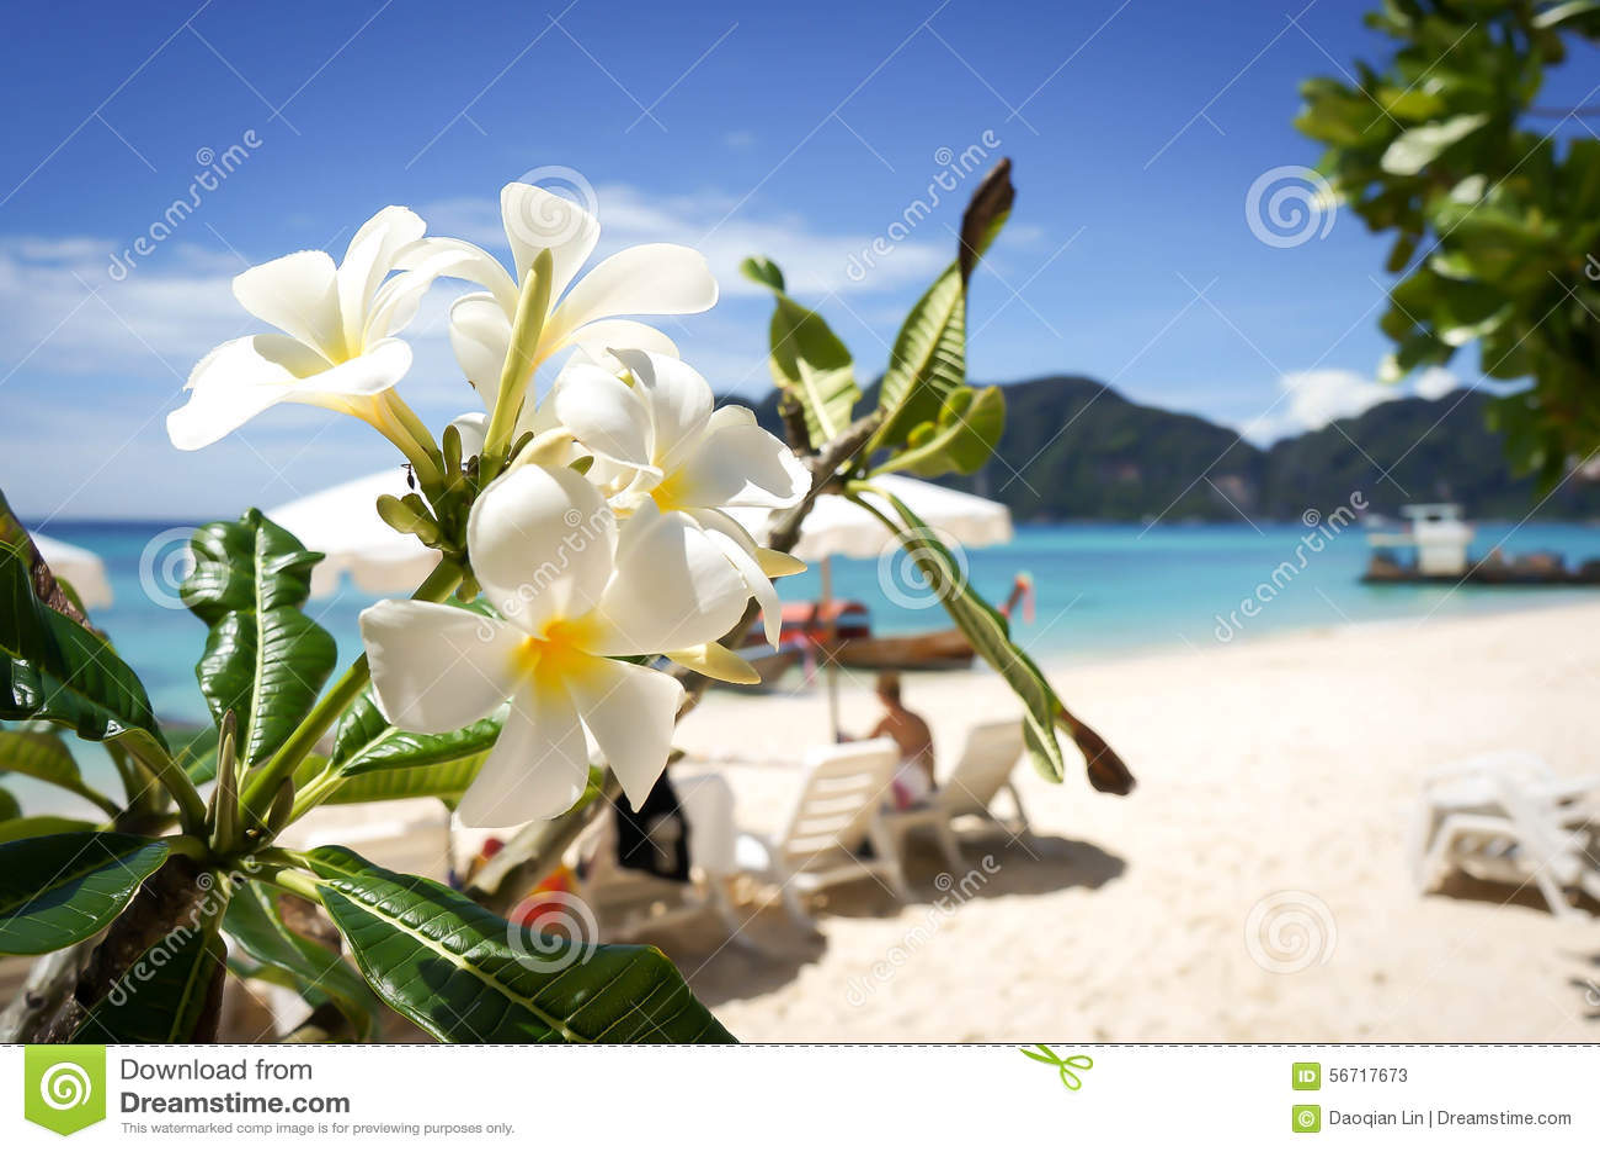 Tropical Island Flowers: Plumeria Flower On Tropical Beach Background Stock Image